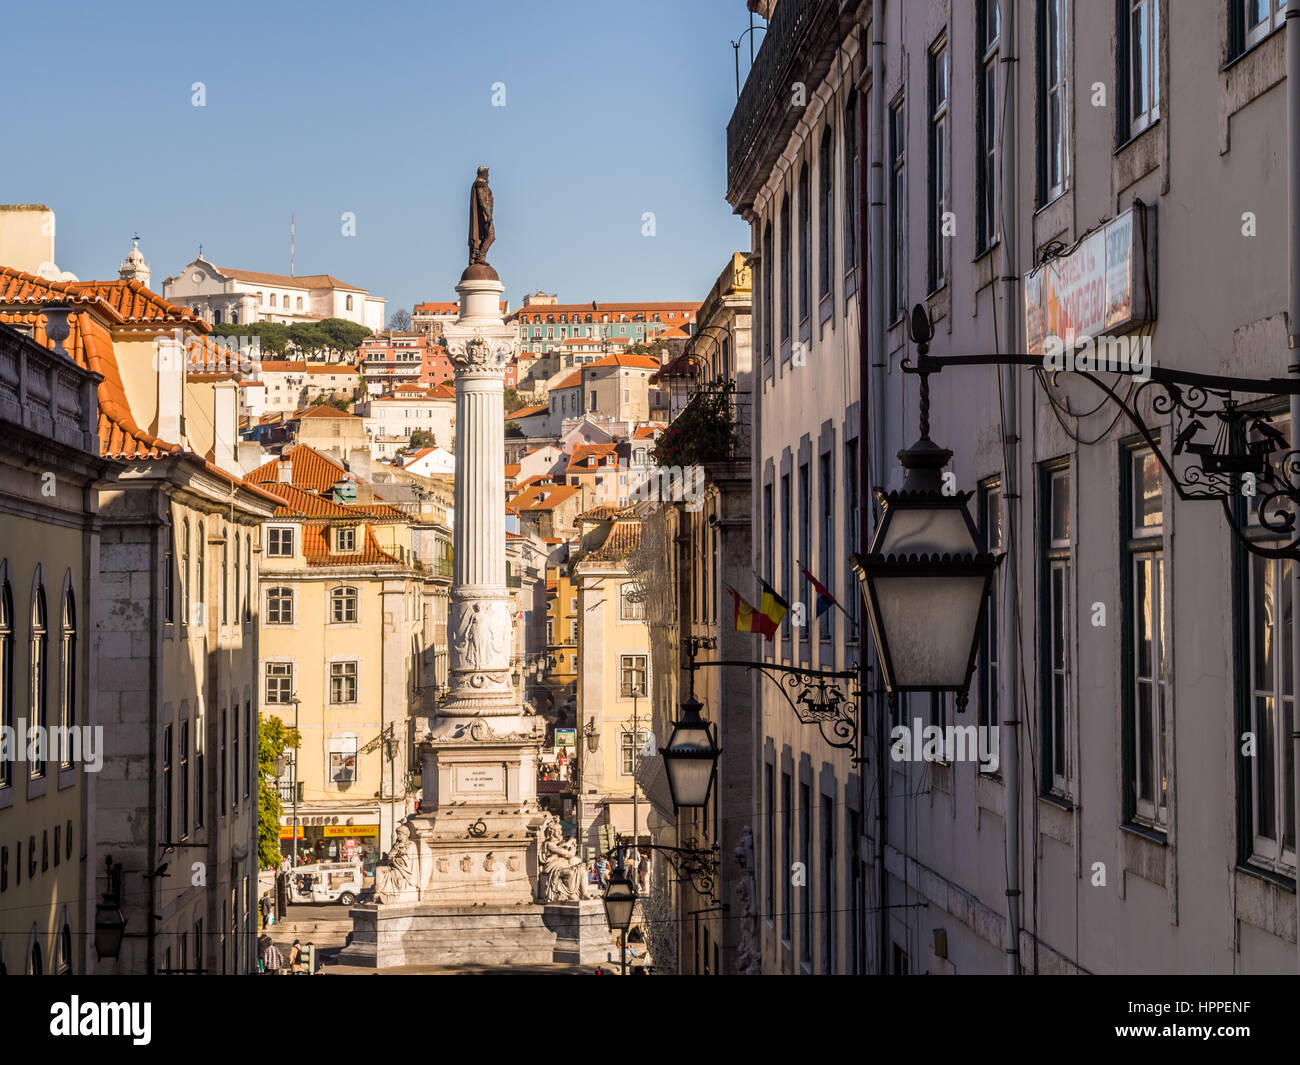 LISBON, PORTUGAL - JANUARY 10, 2017: Column of Pedro IV on Rossio Square (Pedro IV Square) in Lisbon, Portugal, - Stock Image